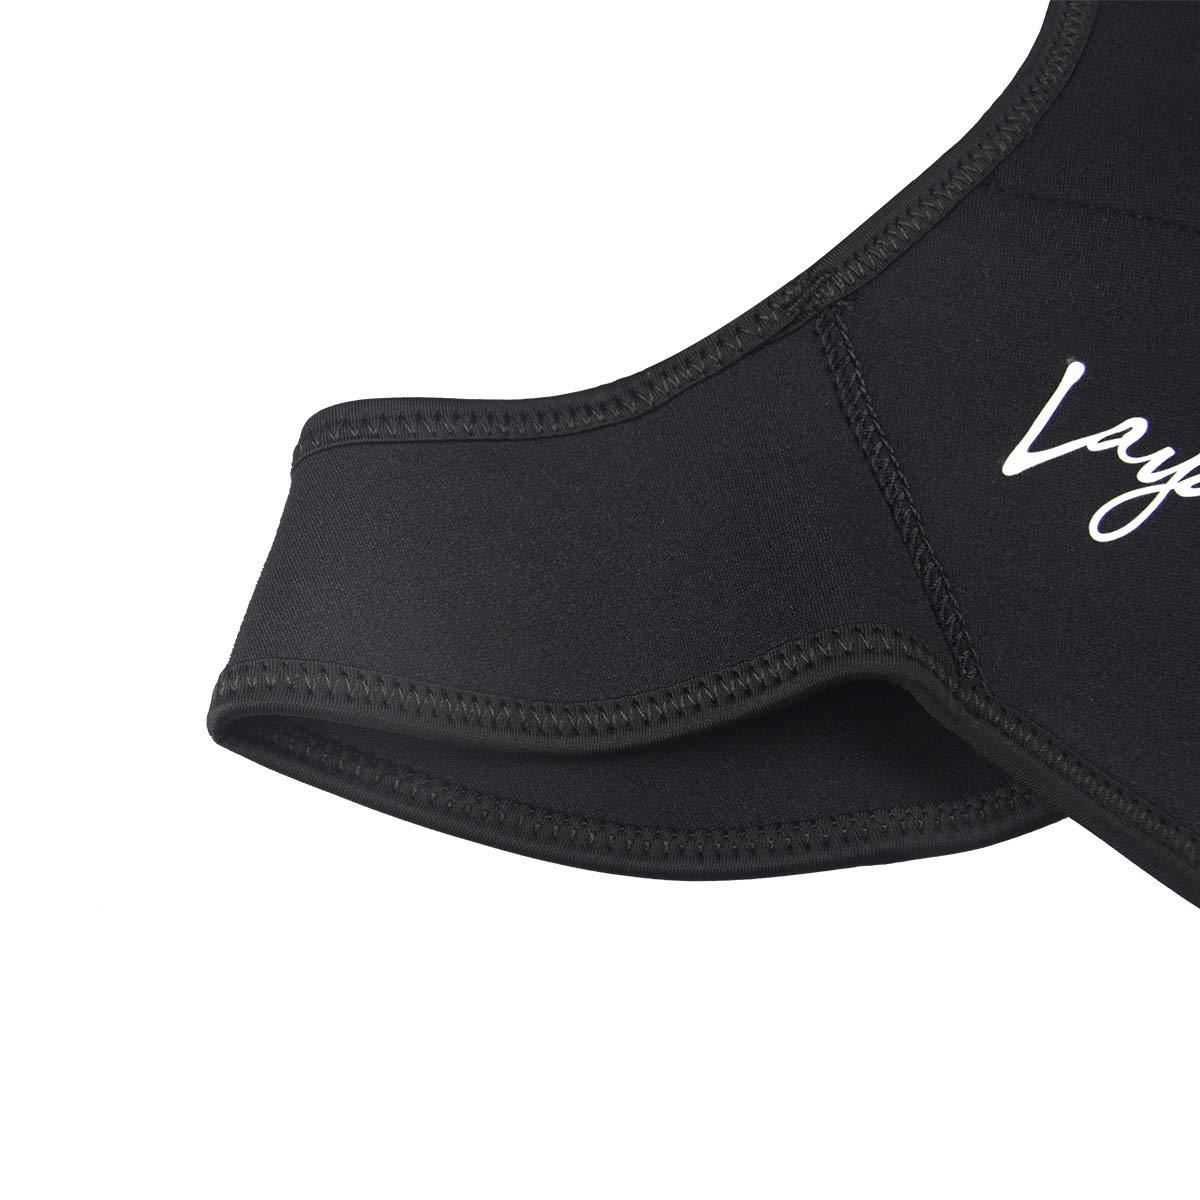 Layatone Weight Vest Men 2mm//3mm Neoprene Diving Vest Fitness Running Training Vest Gym Walking Weights Vest with Adjustable Straps Sport Weighted Vest Women